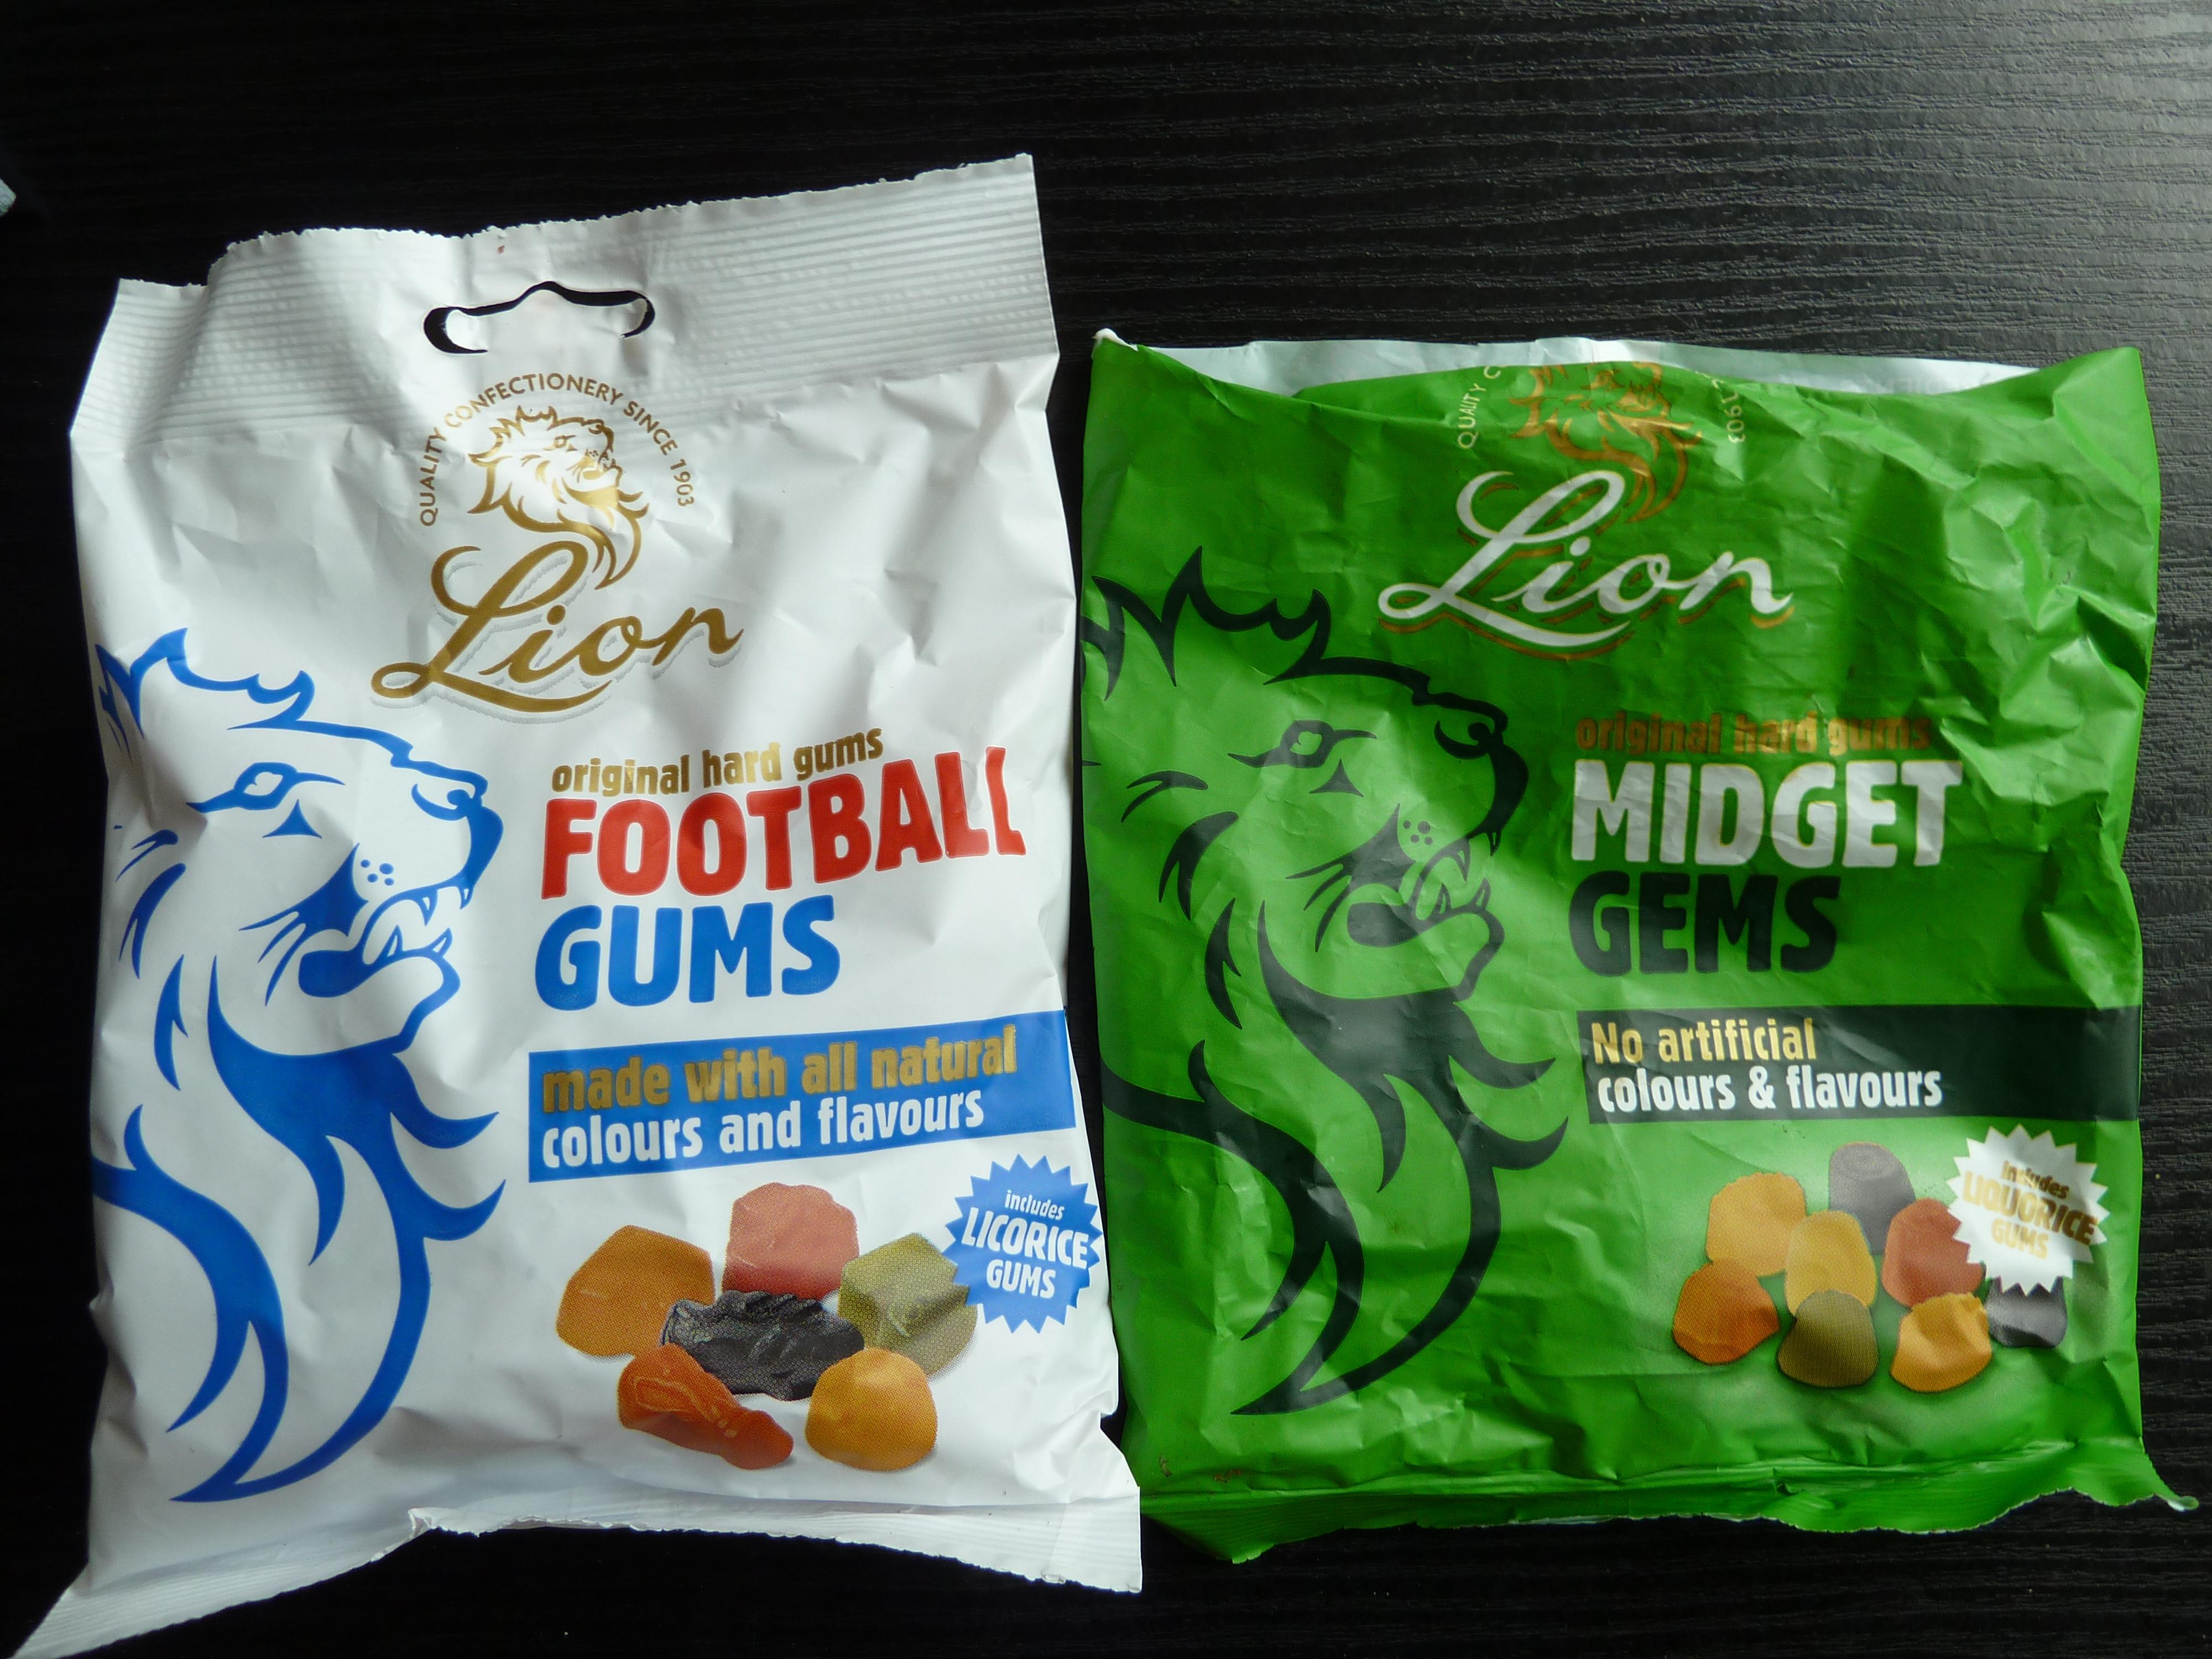 Lion Football Gums and Midget Gems 59p for 190g @ Home Bargains